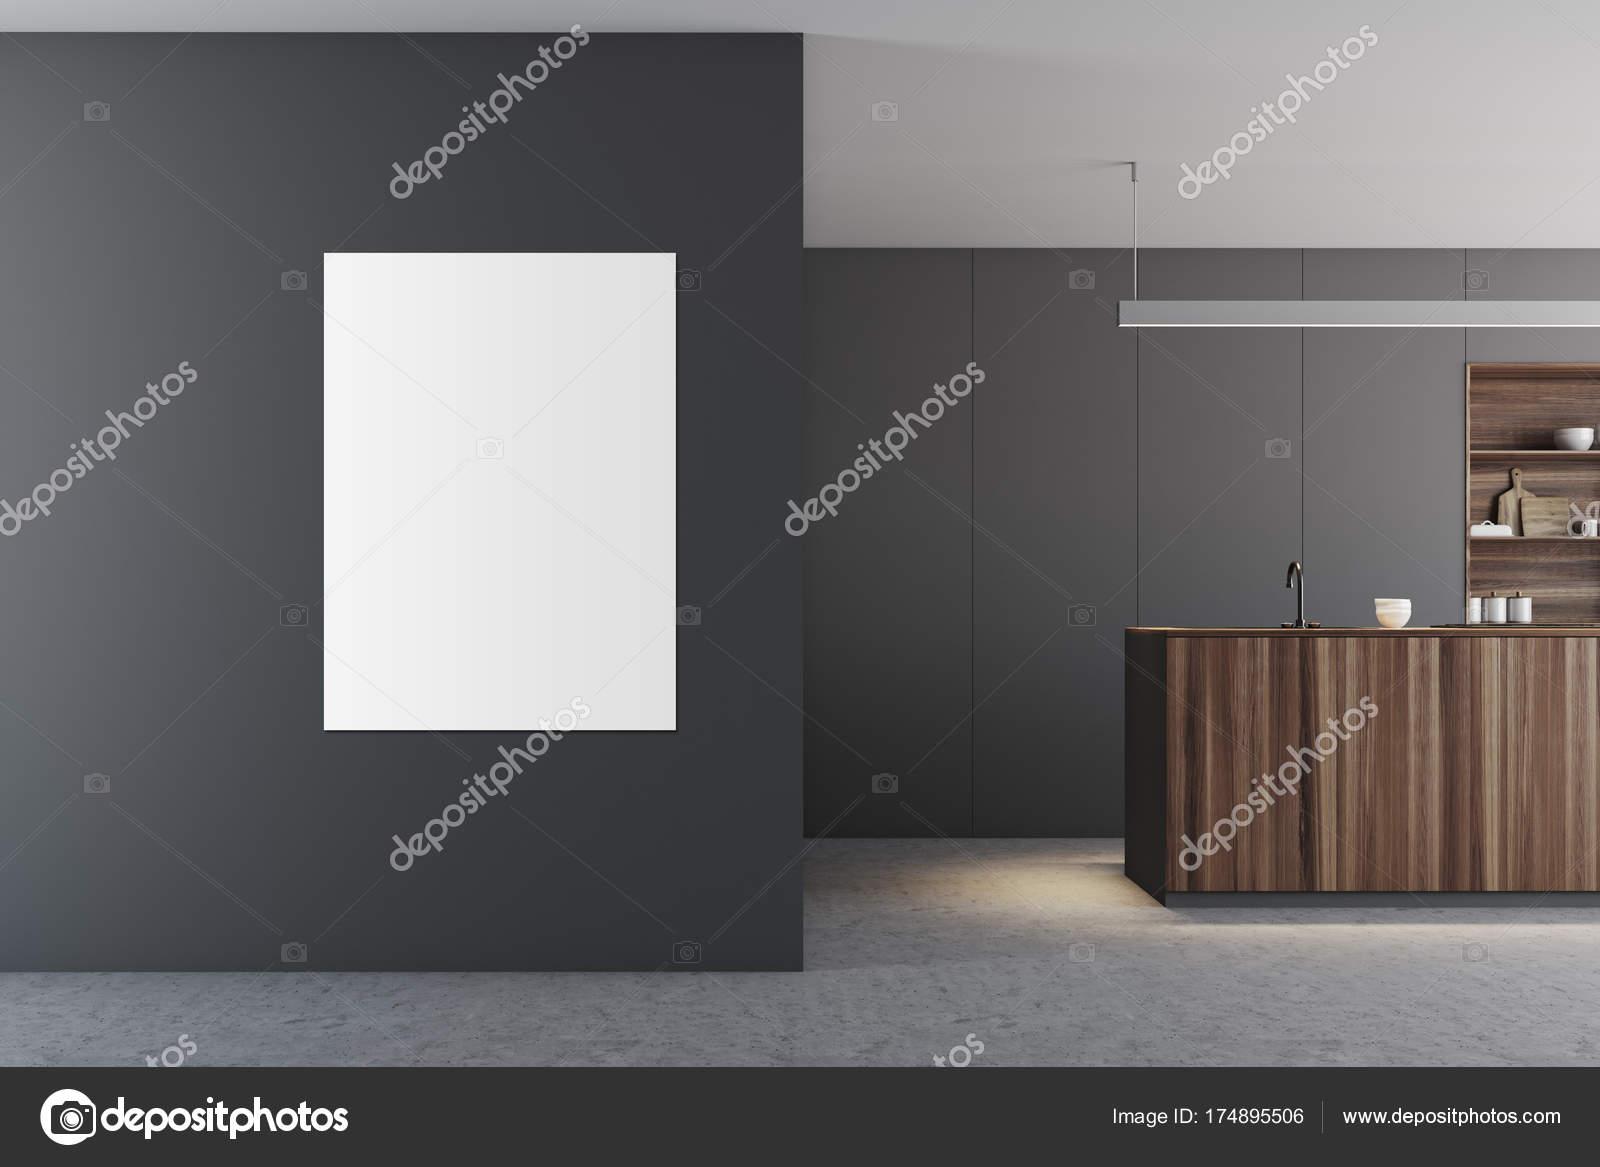 Grey Keuken Houten : Grijze keuken houten bar poster u stockfoto denisismagilov